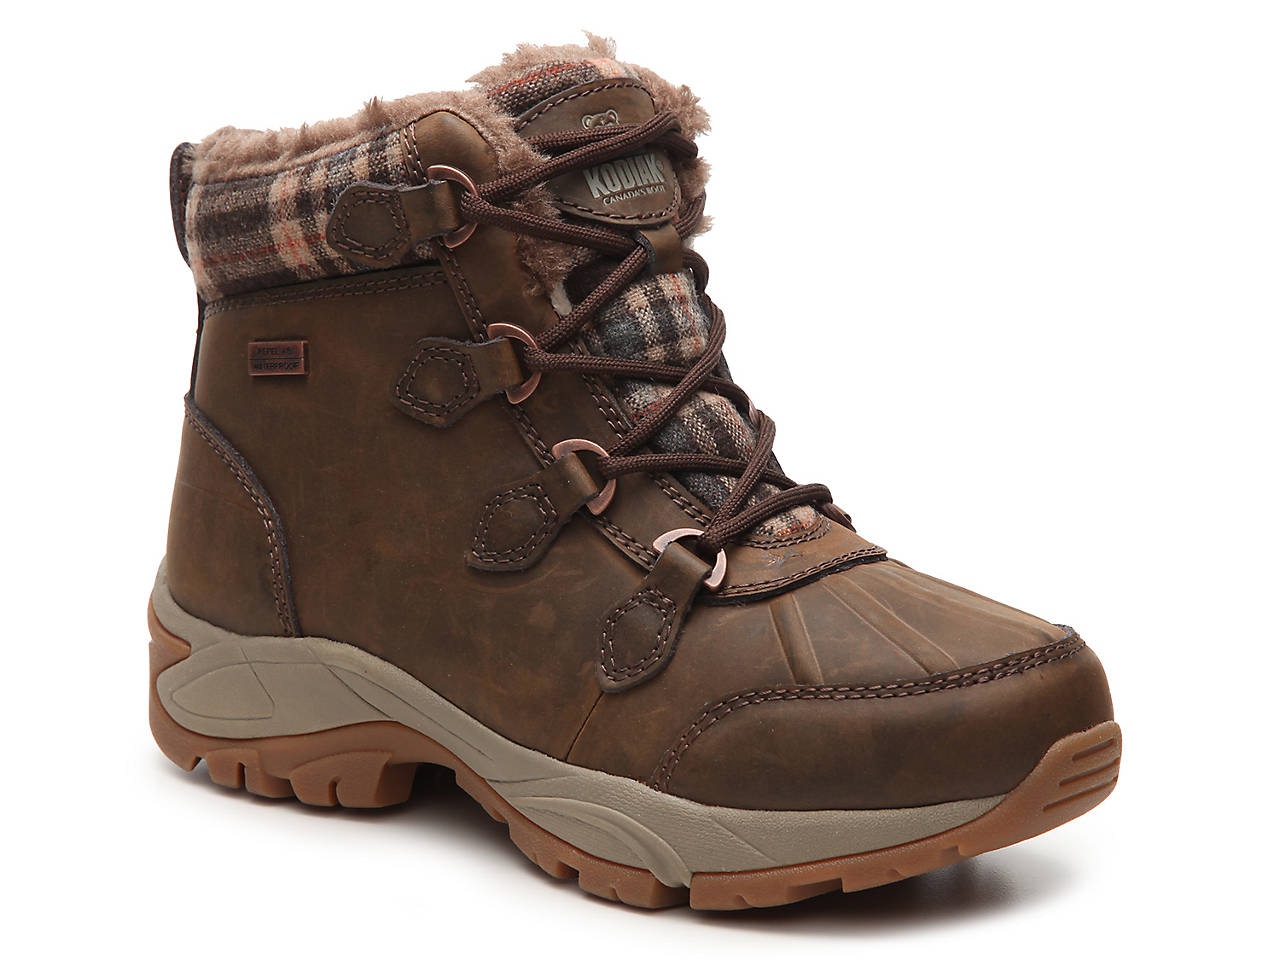 Kodiak Rae Winter Hiker Boot (Women's) zdBH21YvvN